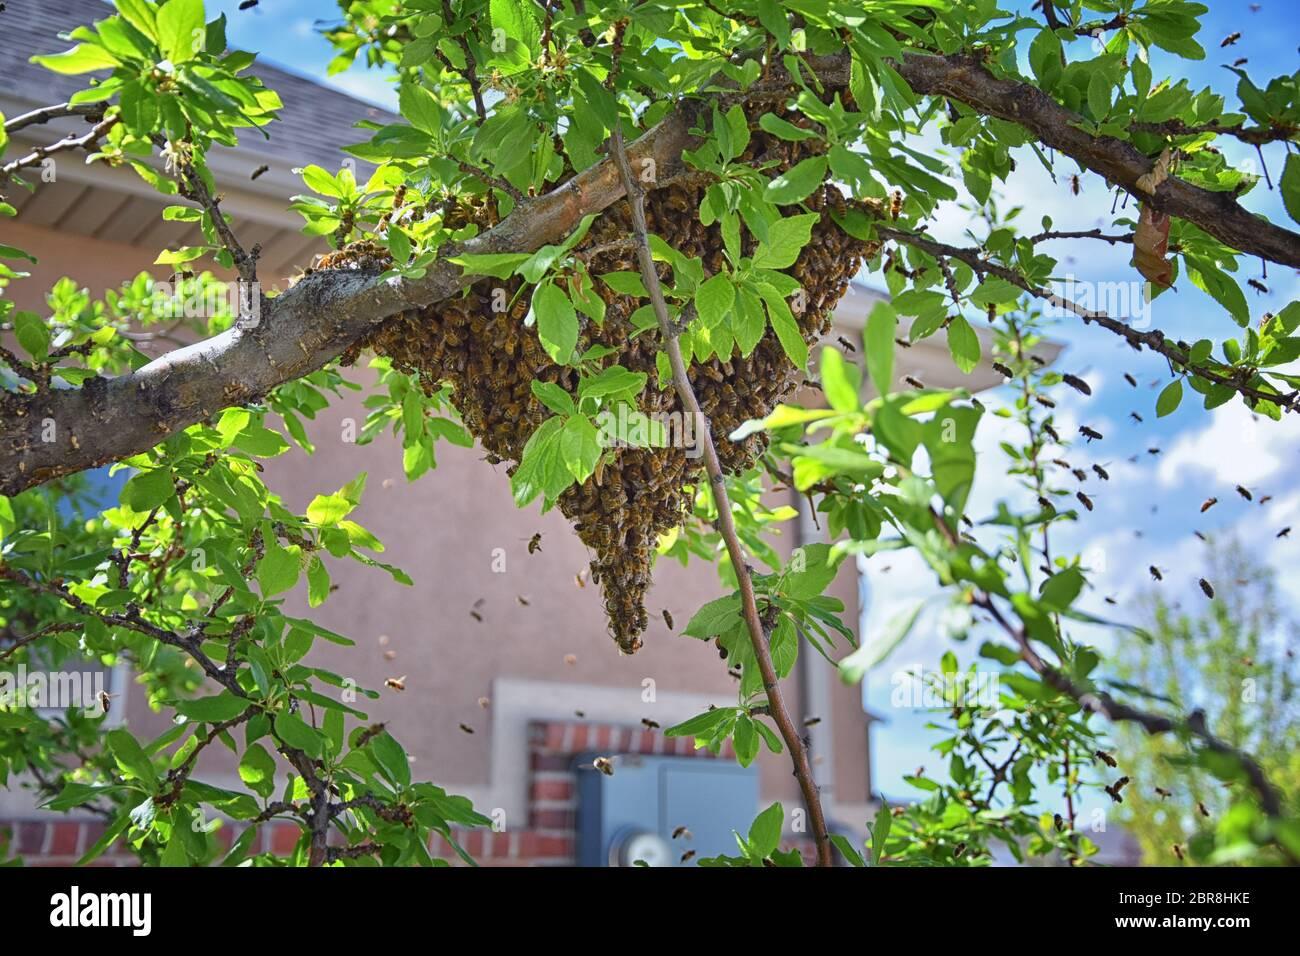 Enjambre de abejas de miel, un insecto eussocial que vuela dentro del género Apis mellifera del clado de la abeja. Enjambre Carniolan abeja italiana en un sujetador de ciruela Foto de stock